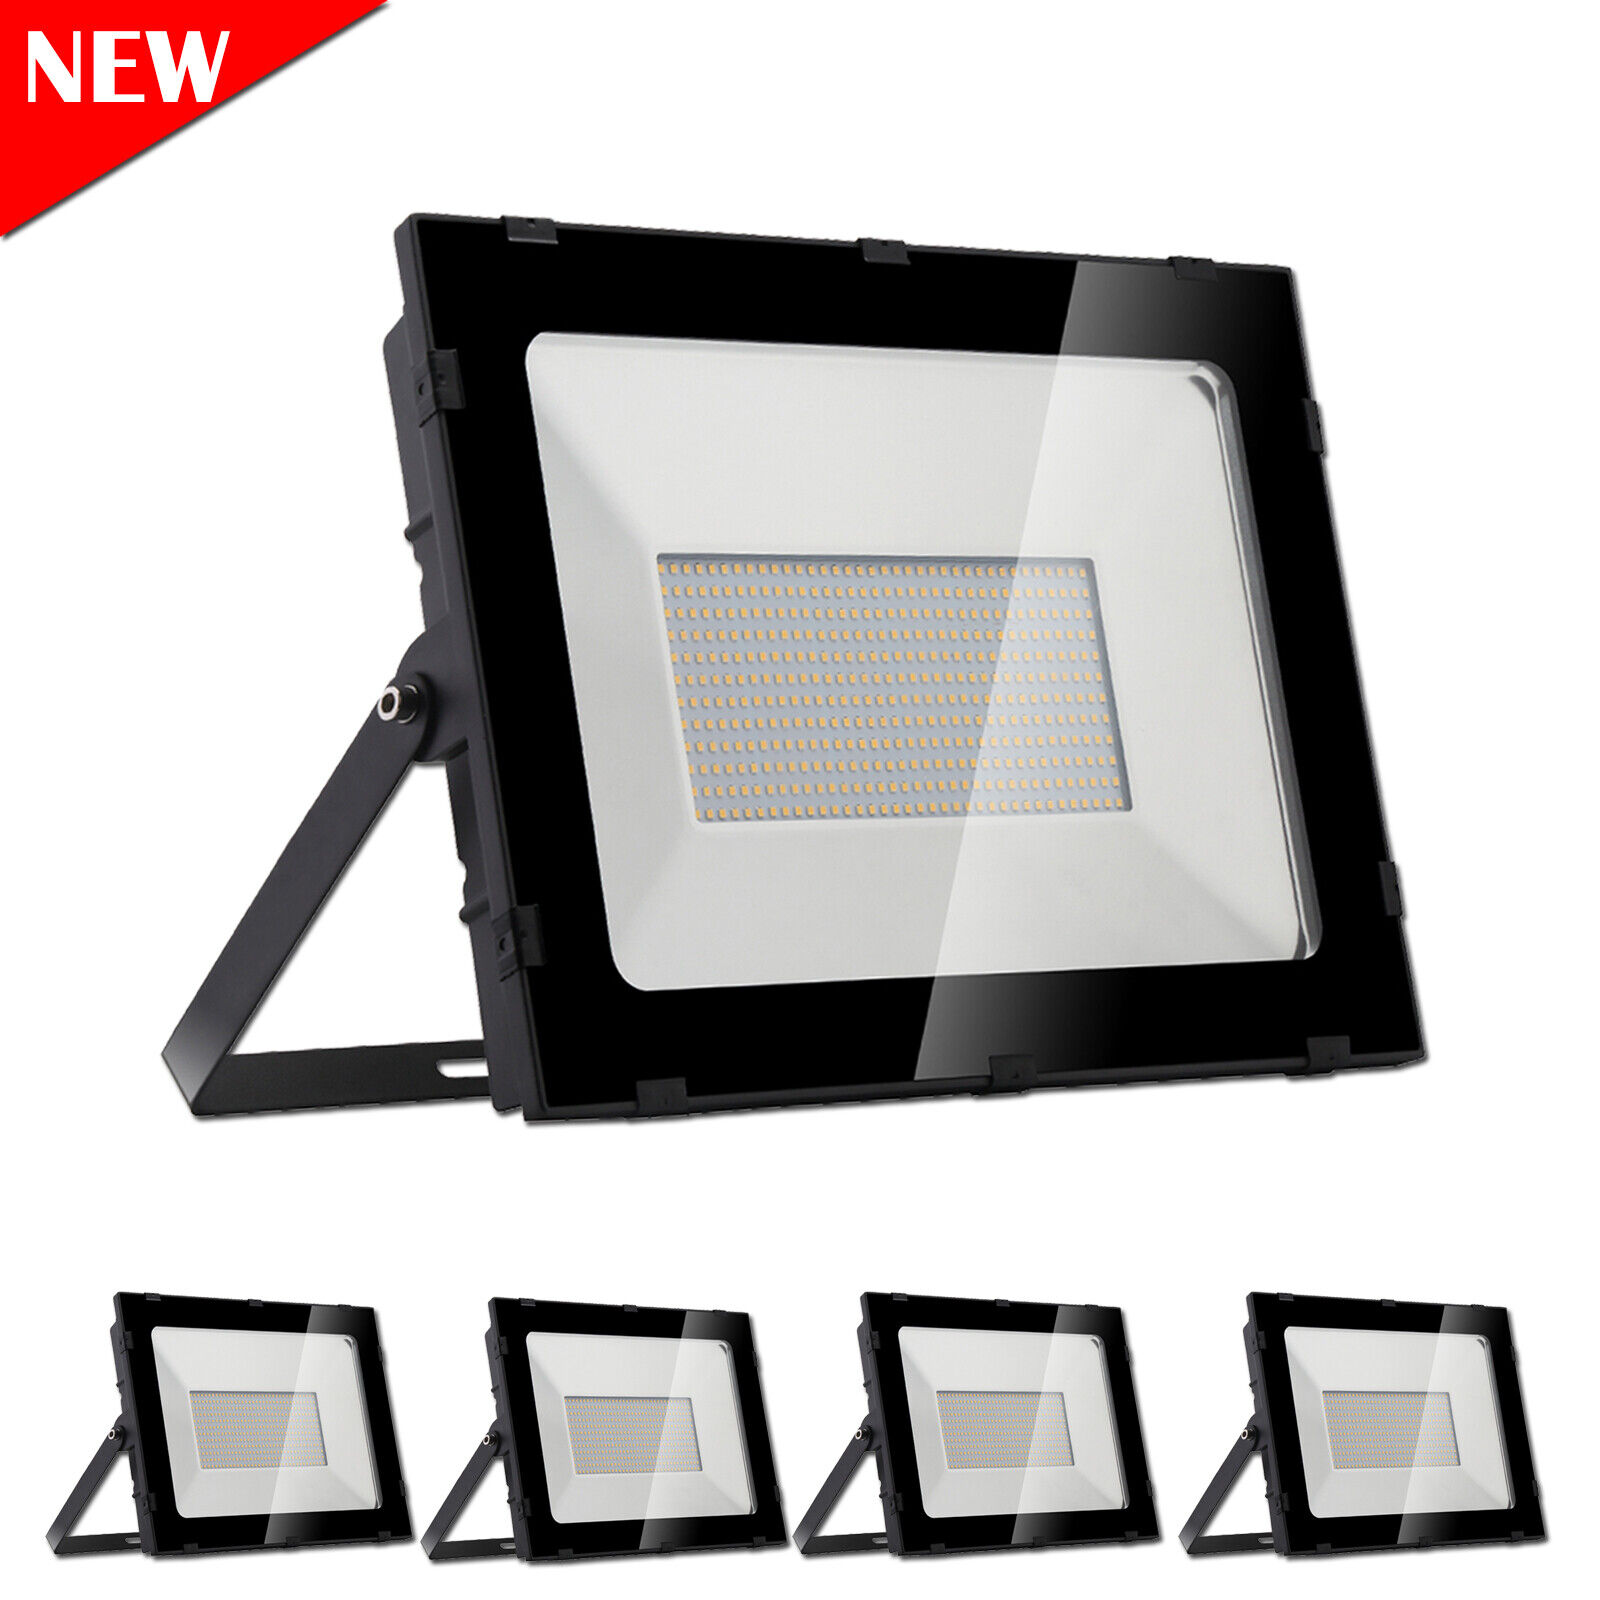 6x 300w LED eh reflector colocado warmweiβ jardín lámpara exterior emisor ultra fina ip65